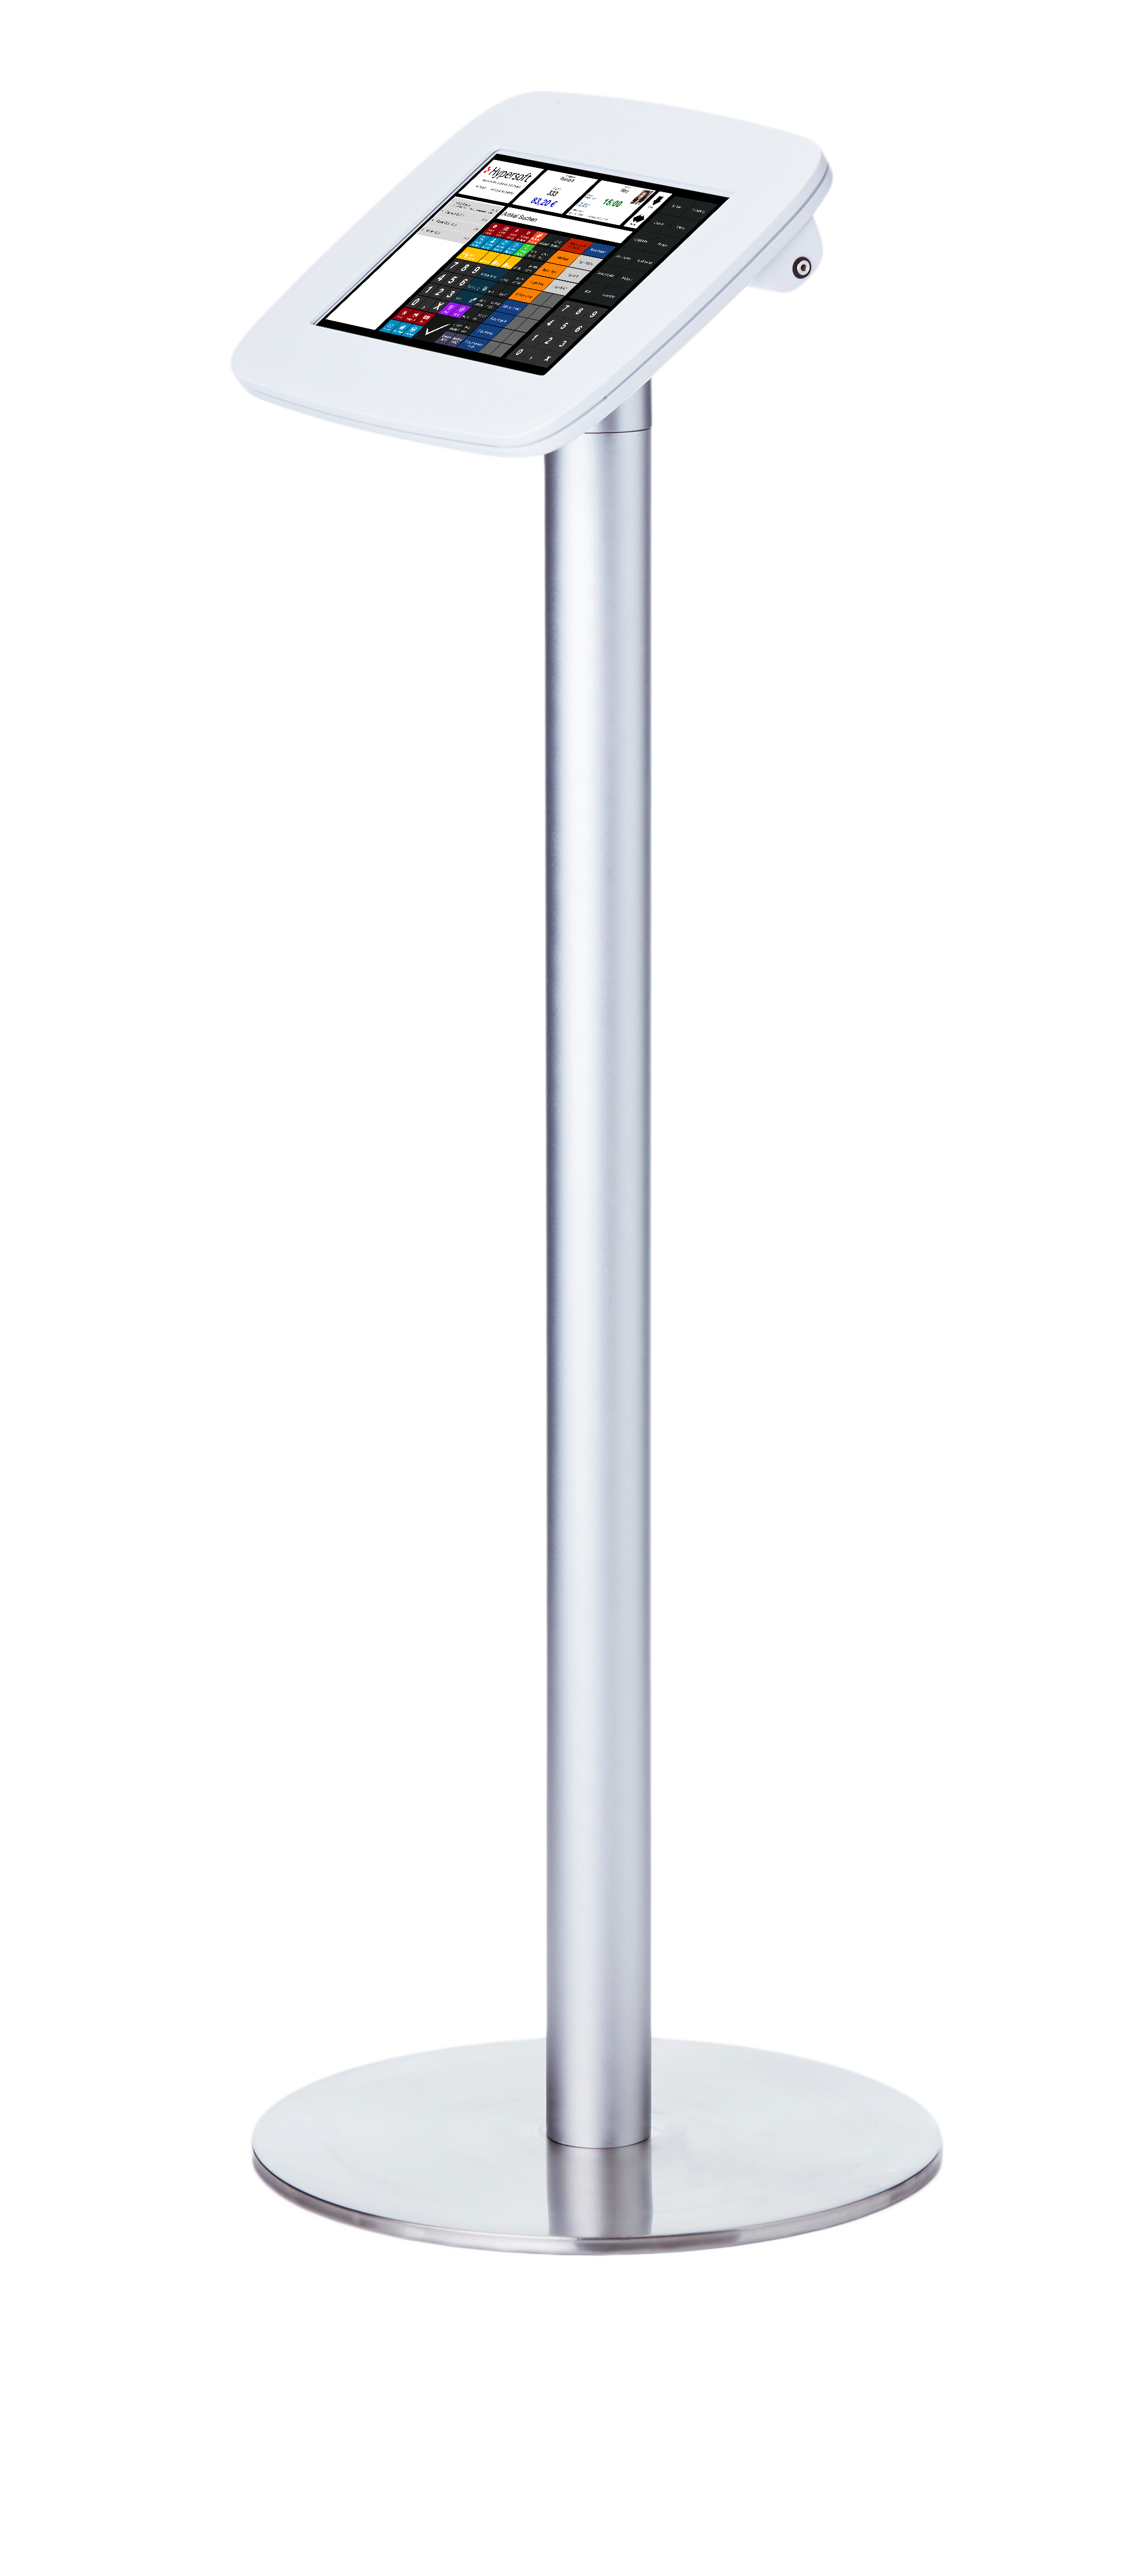 CT200_pedestal-stand_angle-left_freigestellt.png